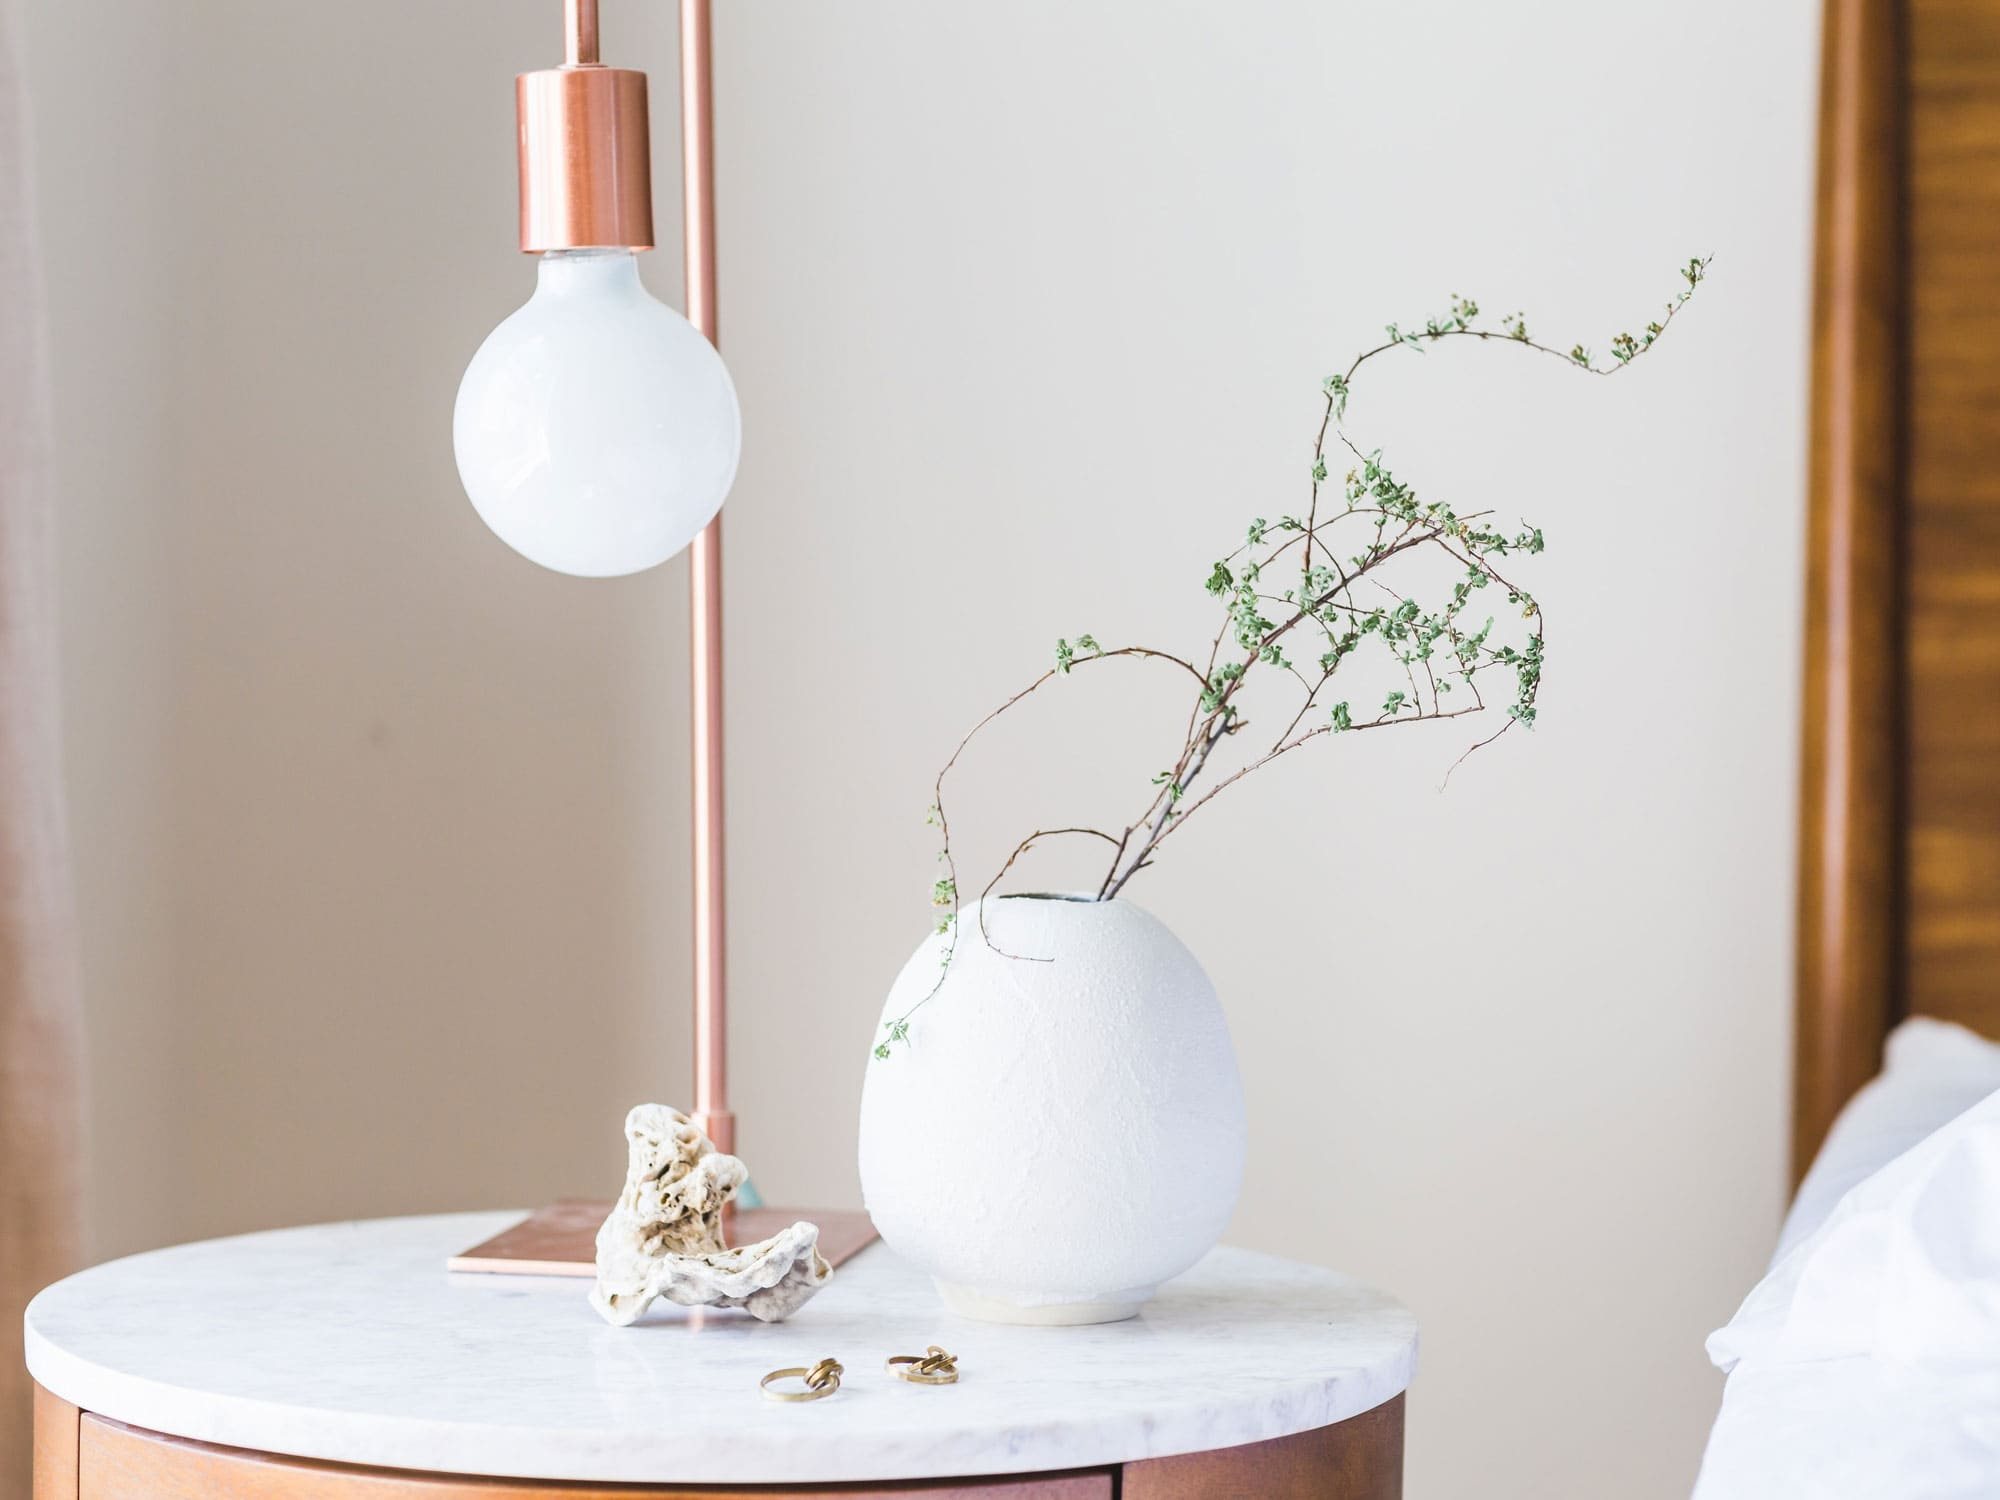 Luxuriöses_Design_exklusive_Farben_Materialien_Lampe